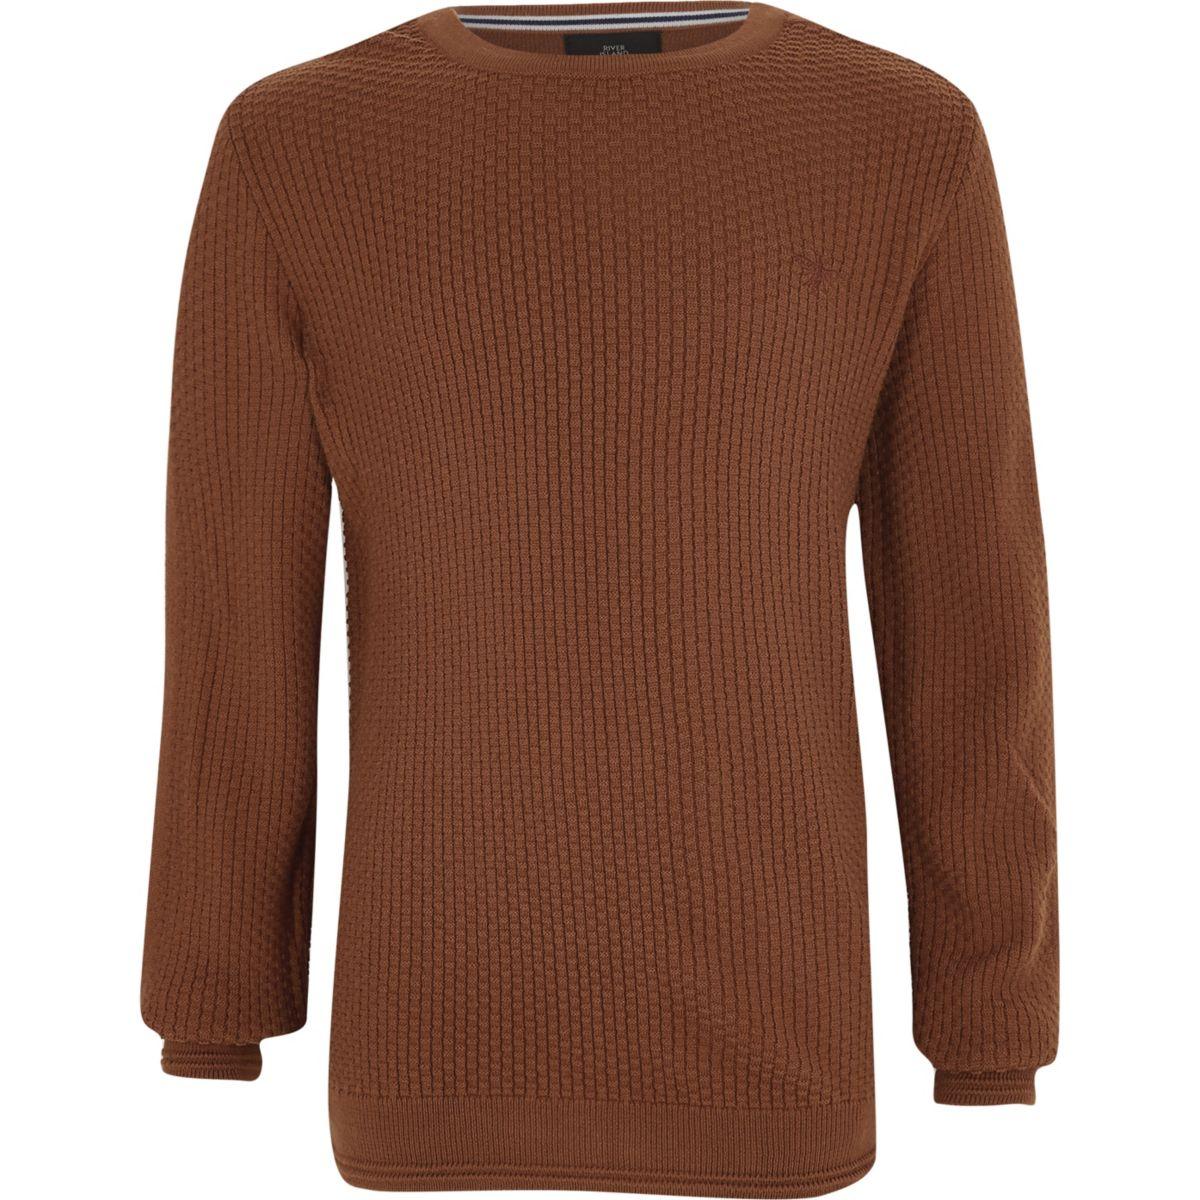 Boys brown textured top